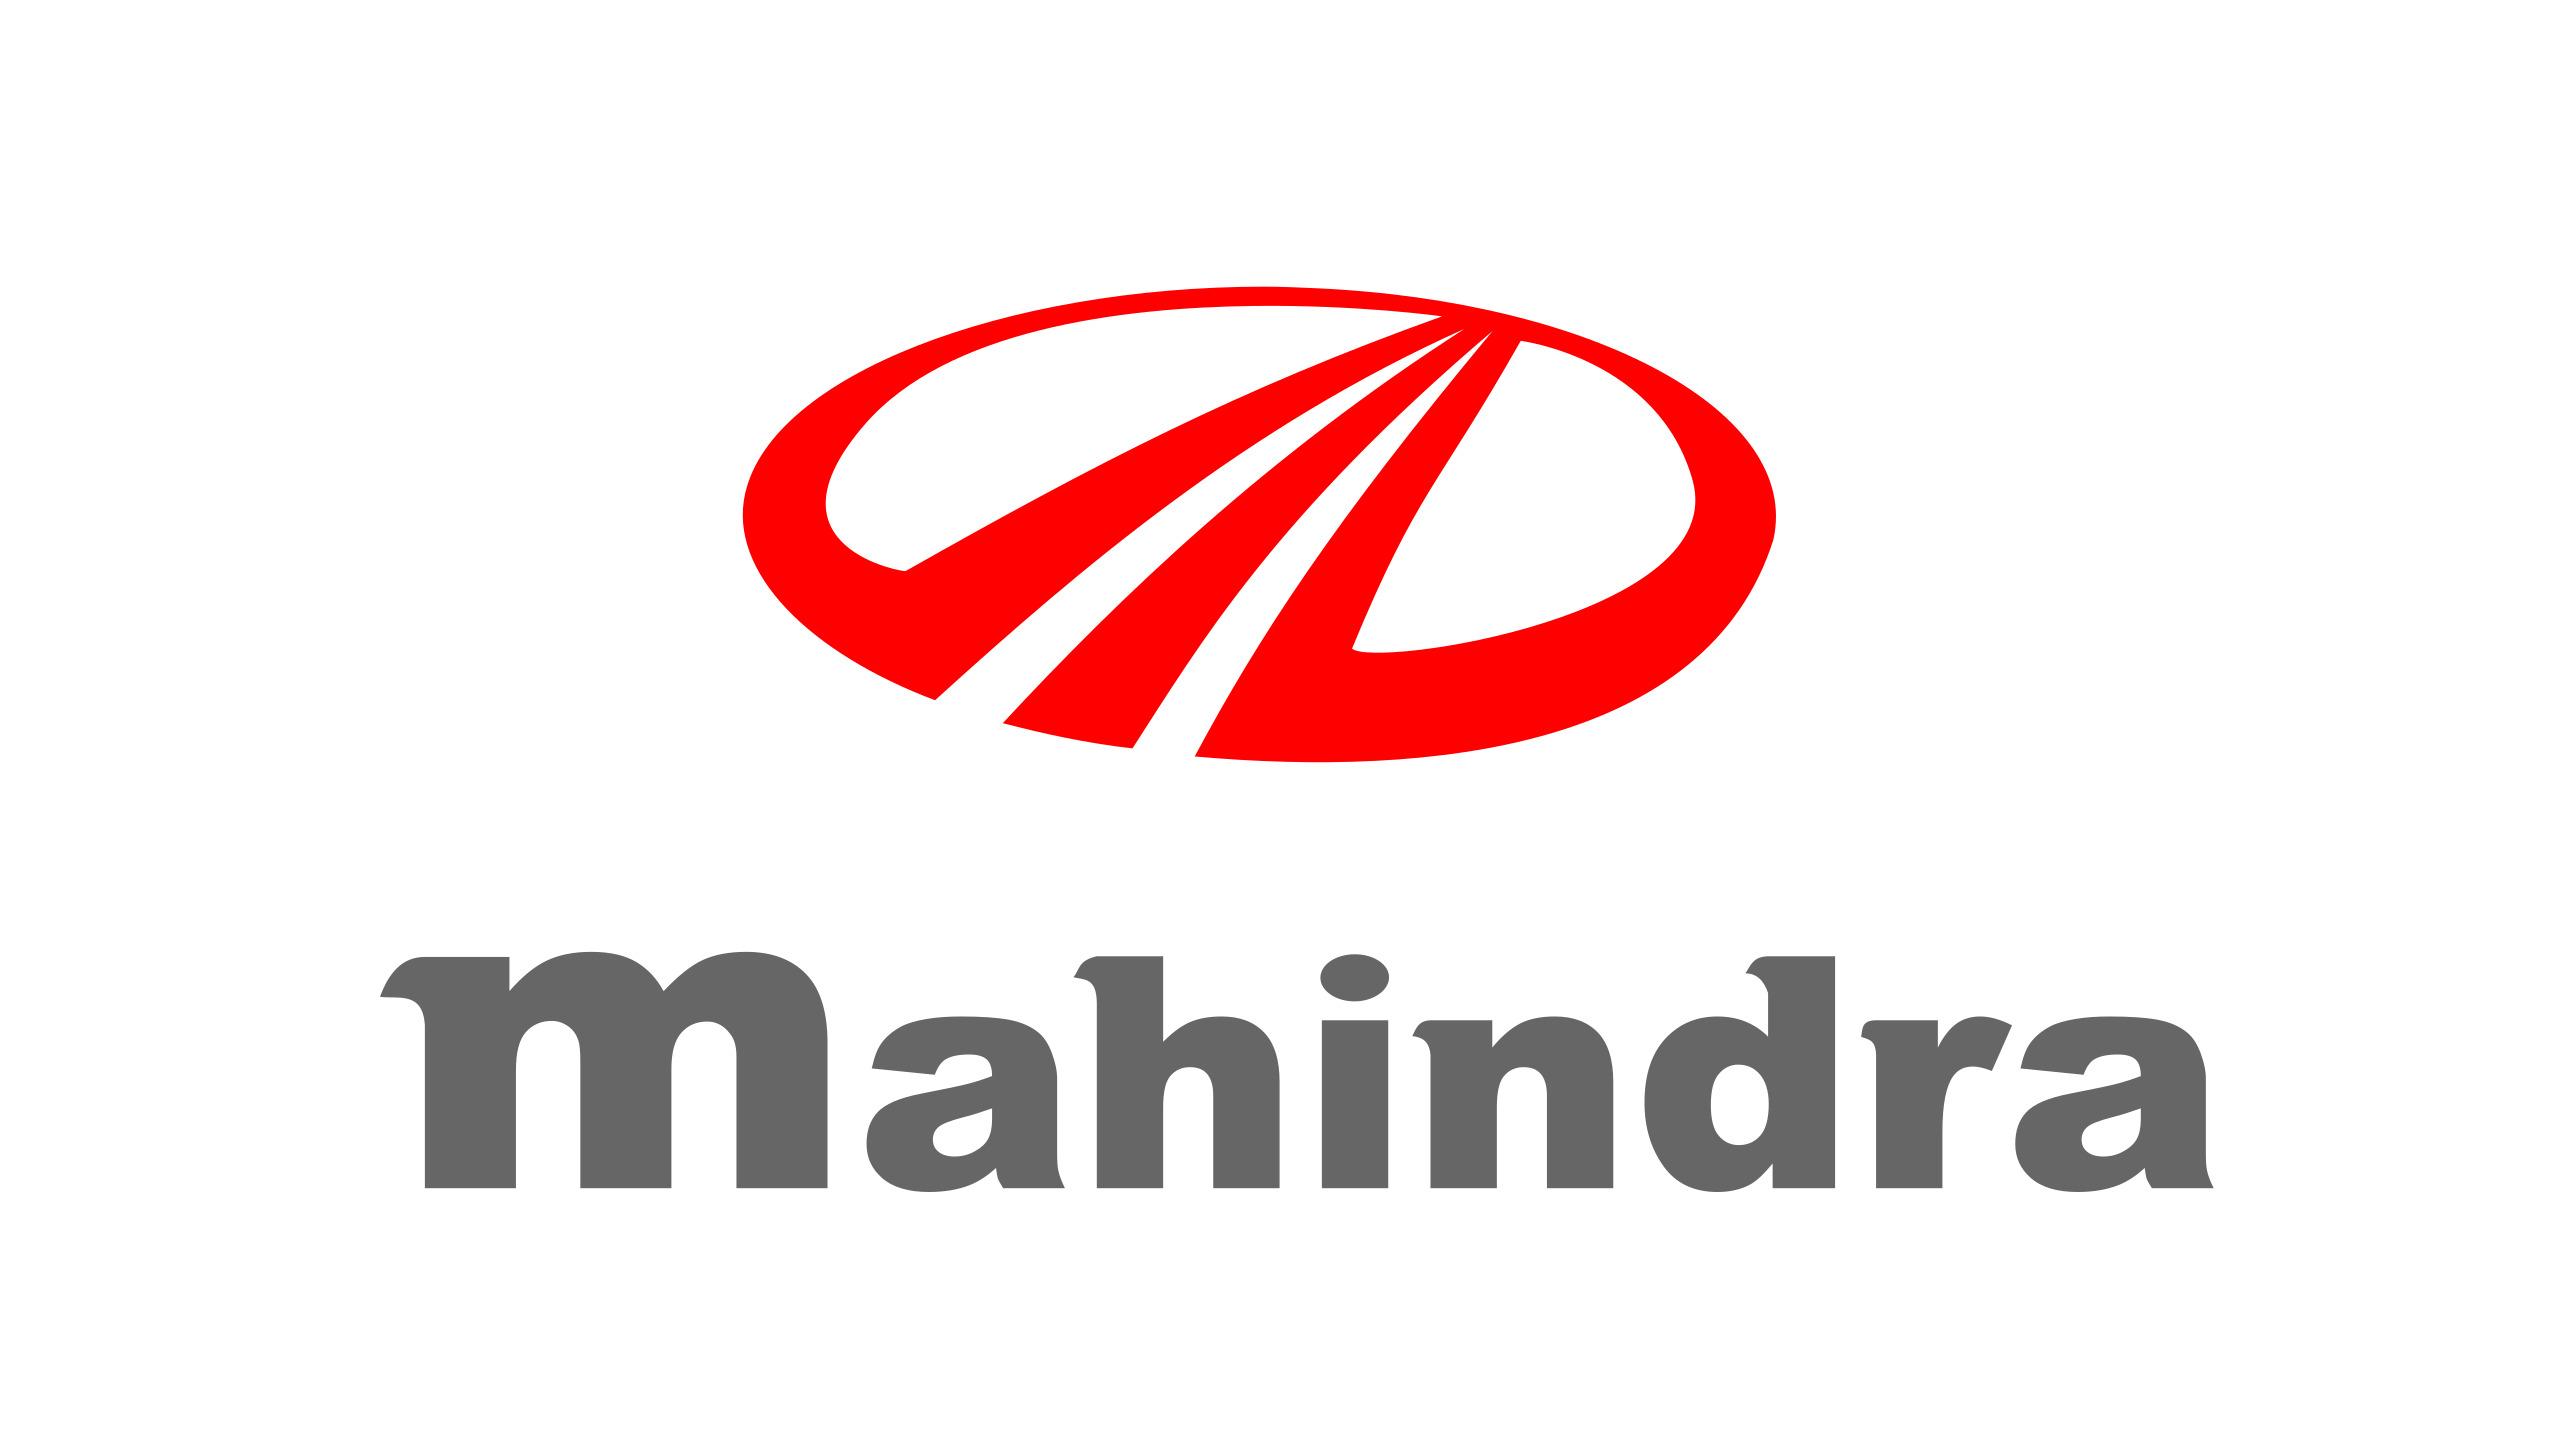 Imagen logo de Mahindra